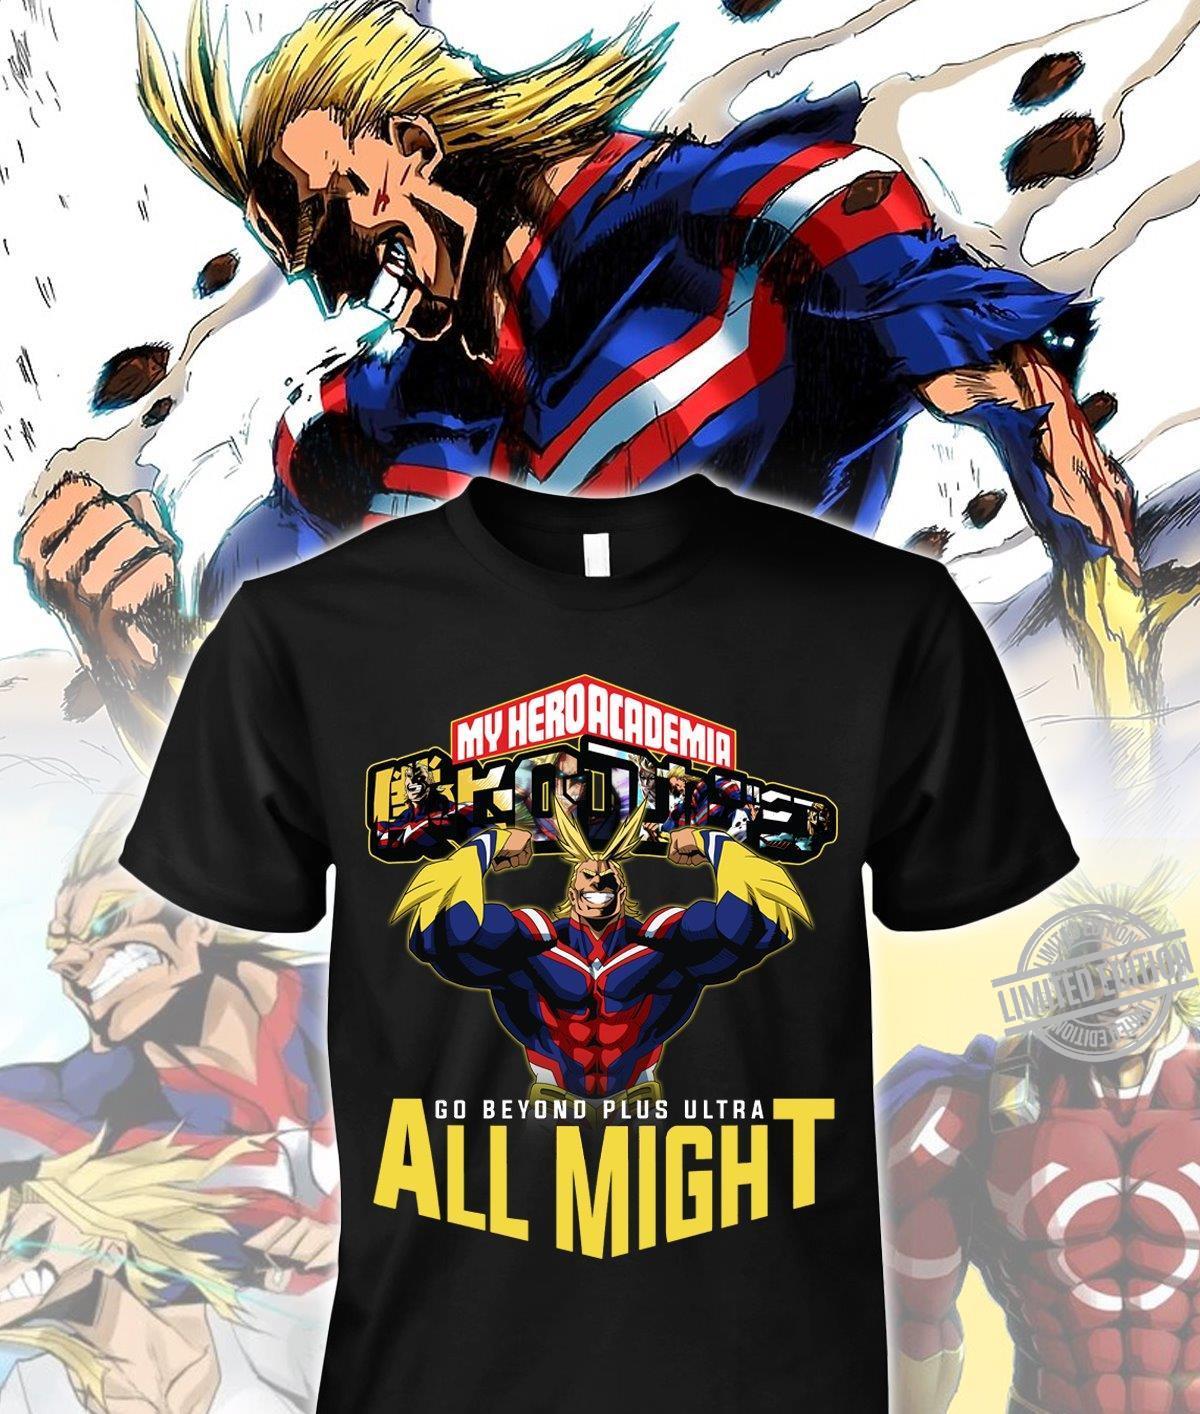 My Hero Academia Go Beyond Plus Yltra All Might Shirt